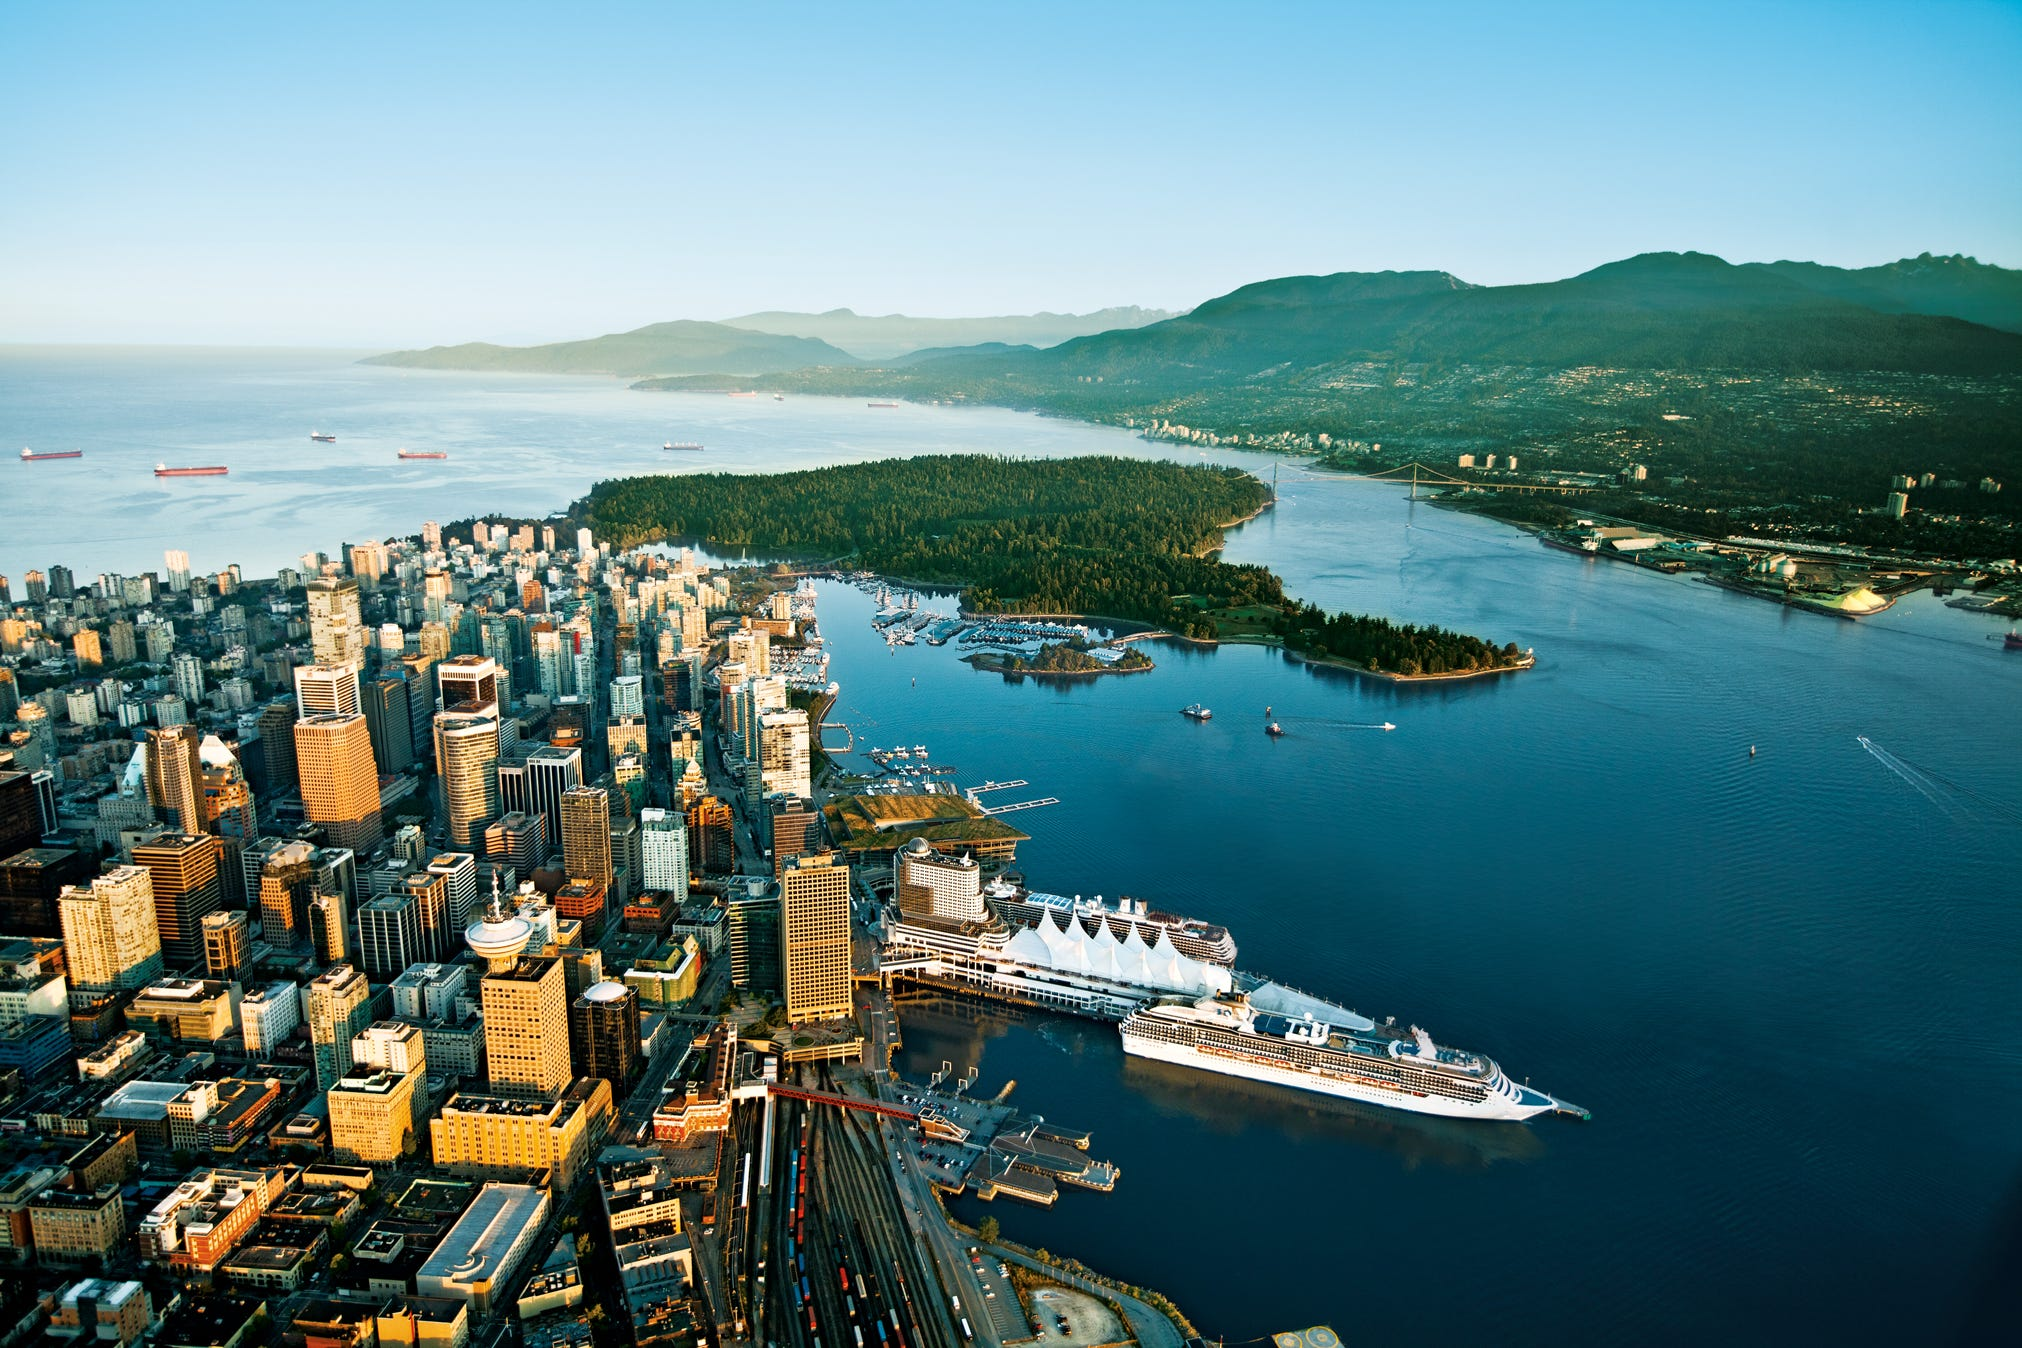 Canada has banned cruises through October to quell spread of coronavirus